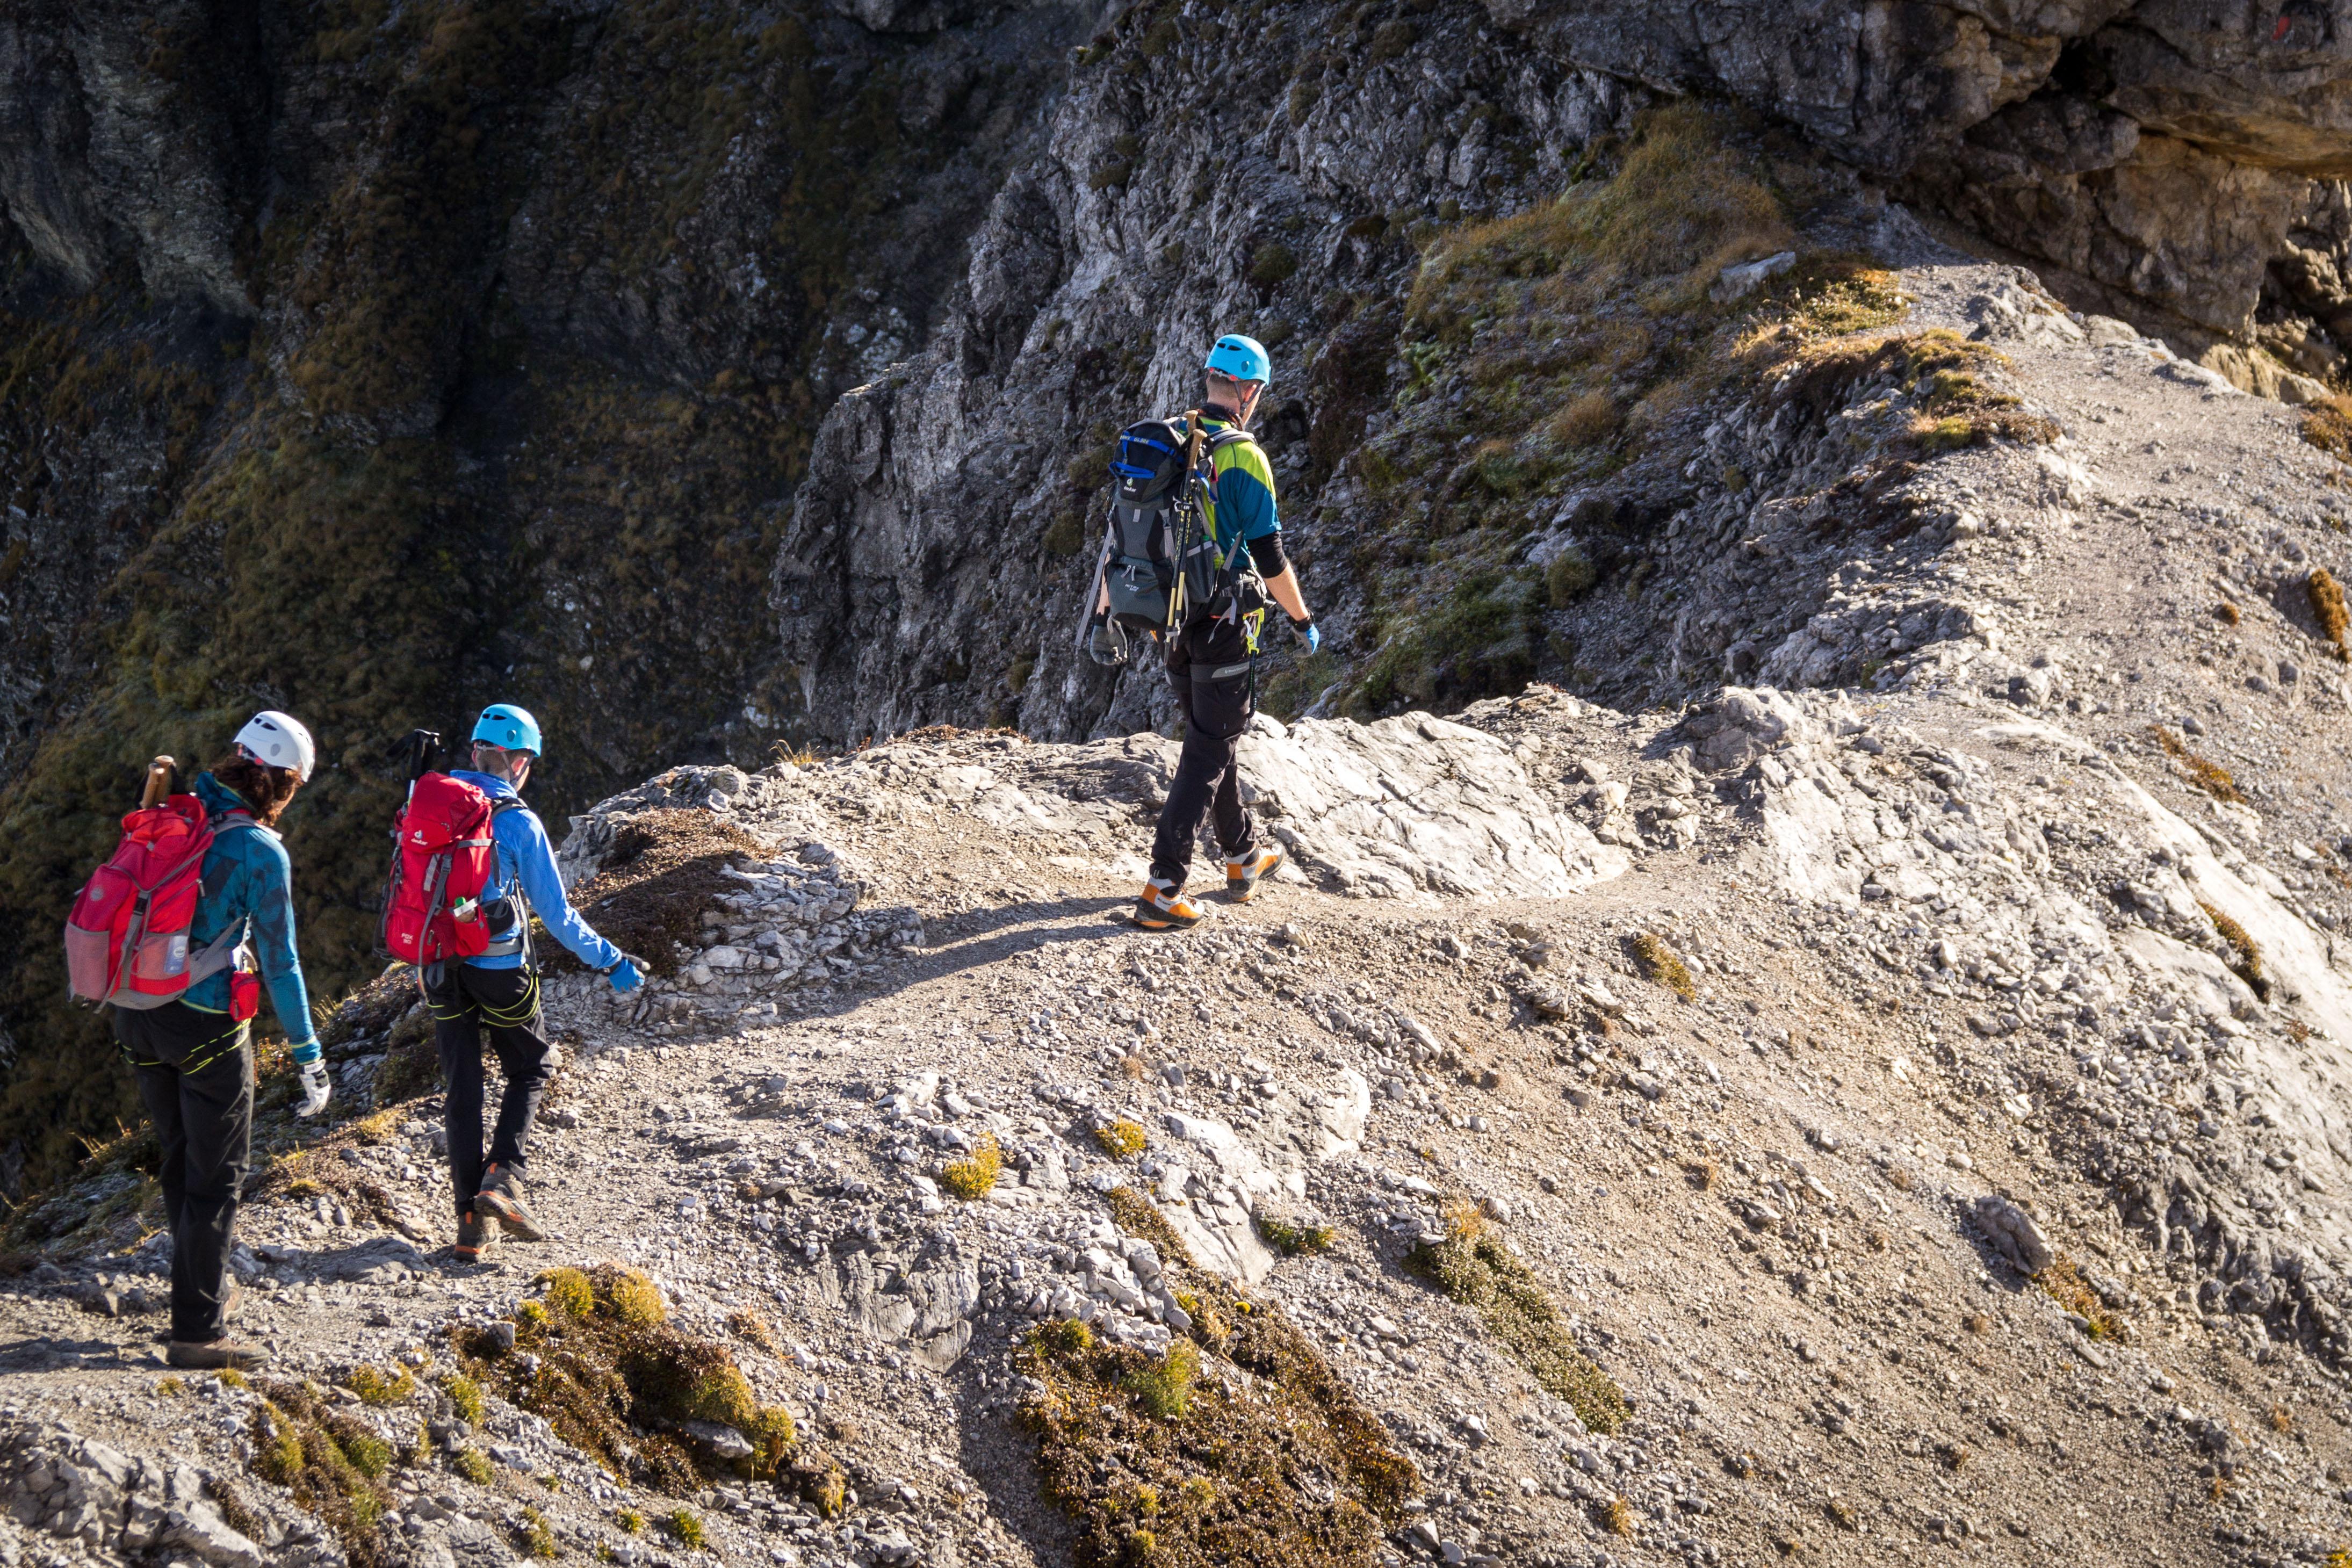 Klettersteig Hindelang : Tödlicher unfall am hindelanger klettersteig